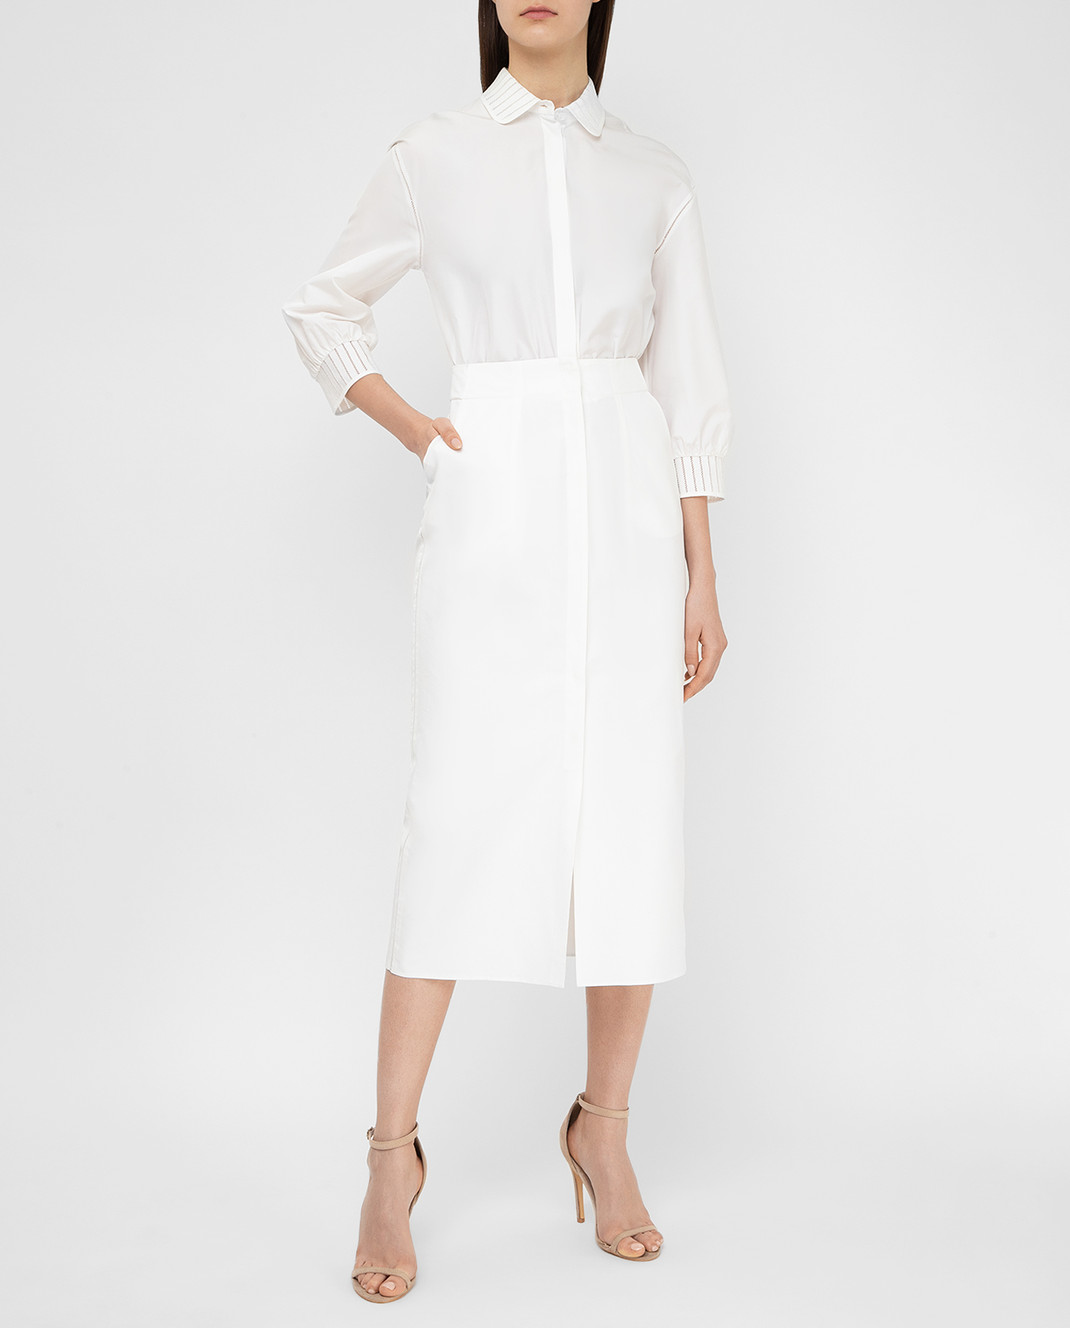 Loro Piana Белое платье F1FAI0540 изображение 2